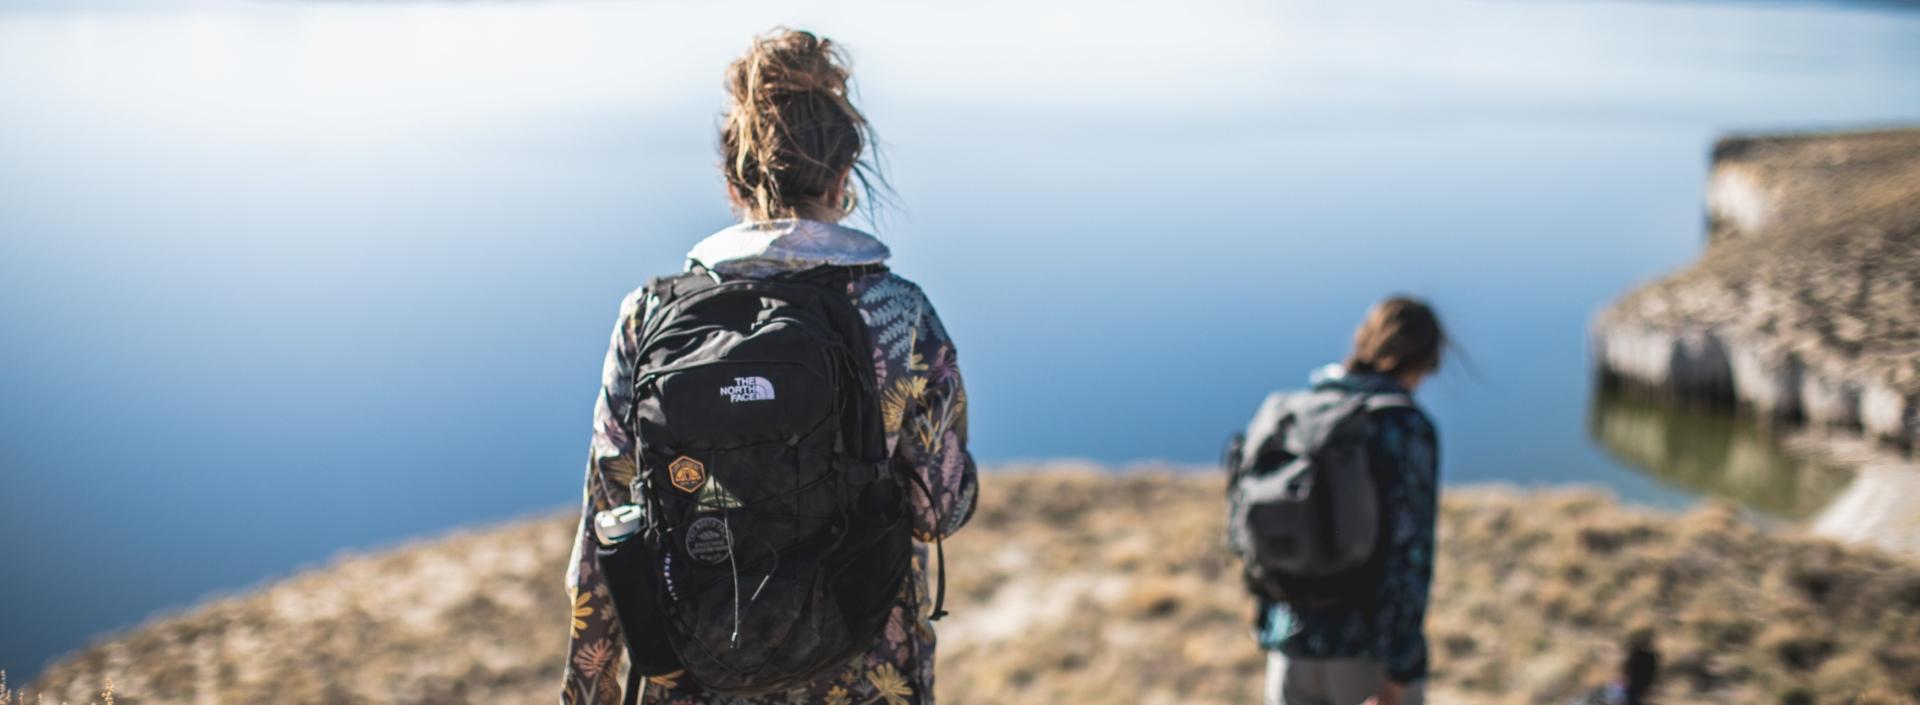 Plecak The North Face - trekking